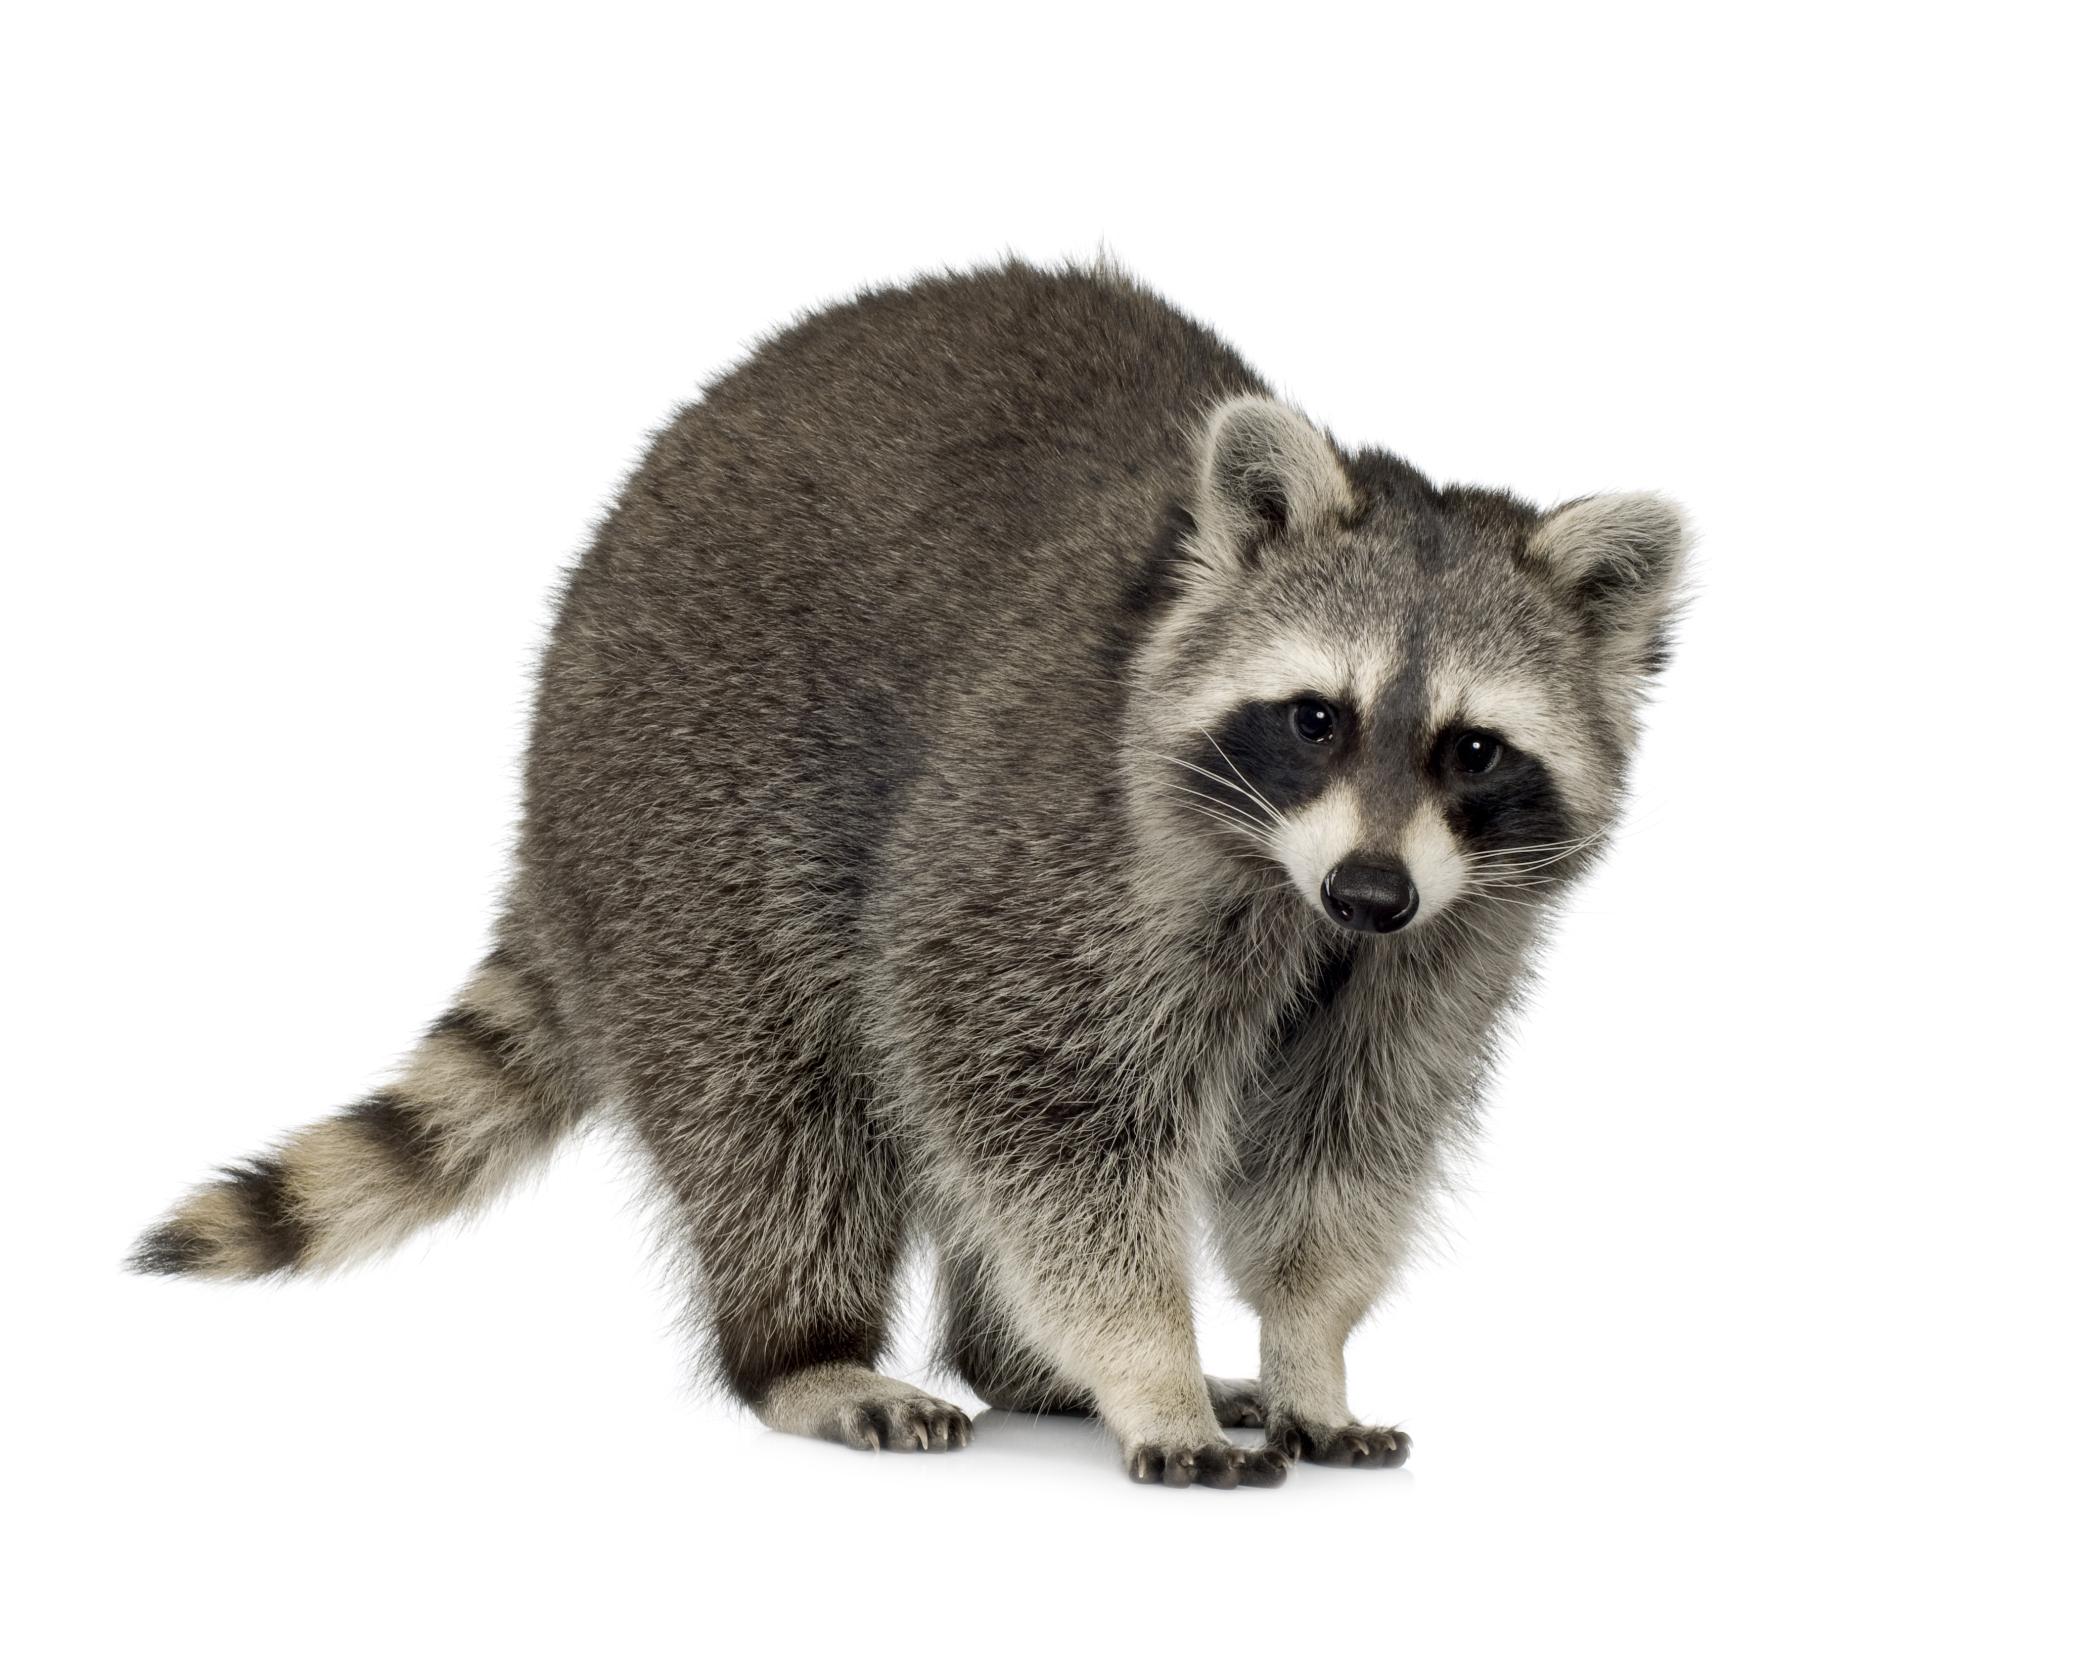 HQ Raccoon Wallpapers | File 1003.03Kb